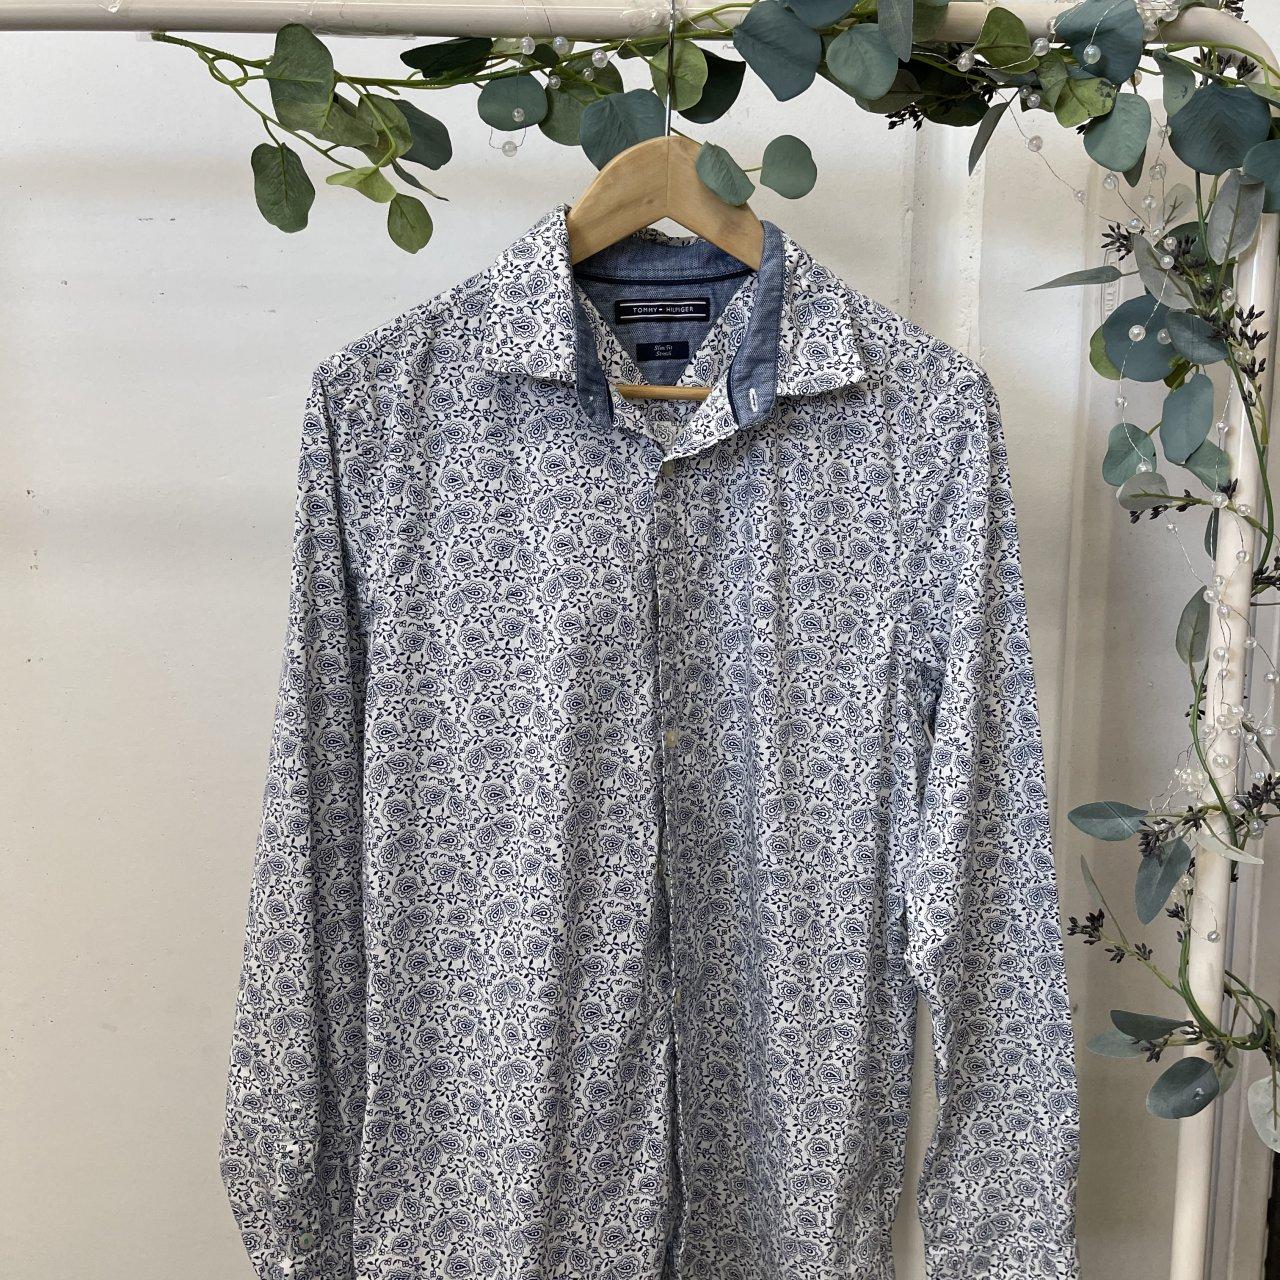 Tommy Hilfiger Men's Button Up Shirt Size S